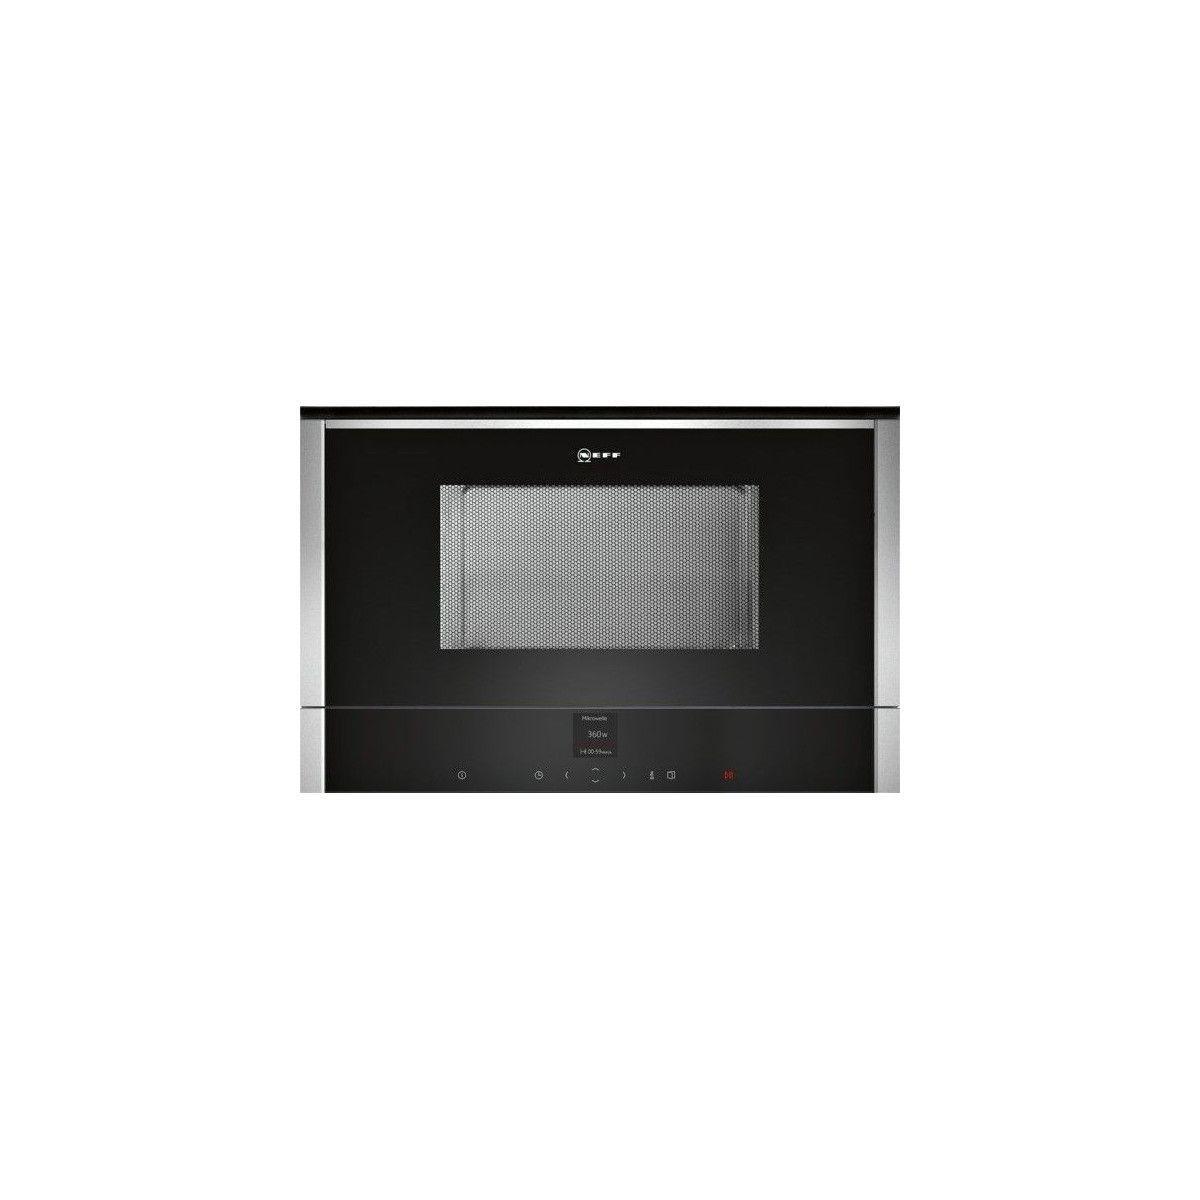 Neff Micro-ondes Encastrable 21l Neff 900w 59.4cm, C 17 Wr 00 N 0